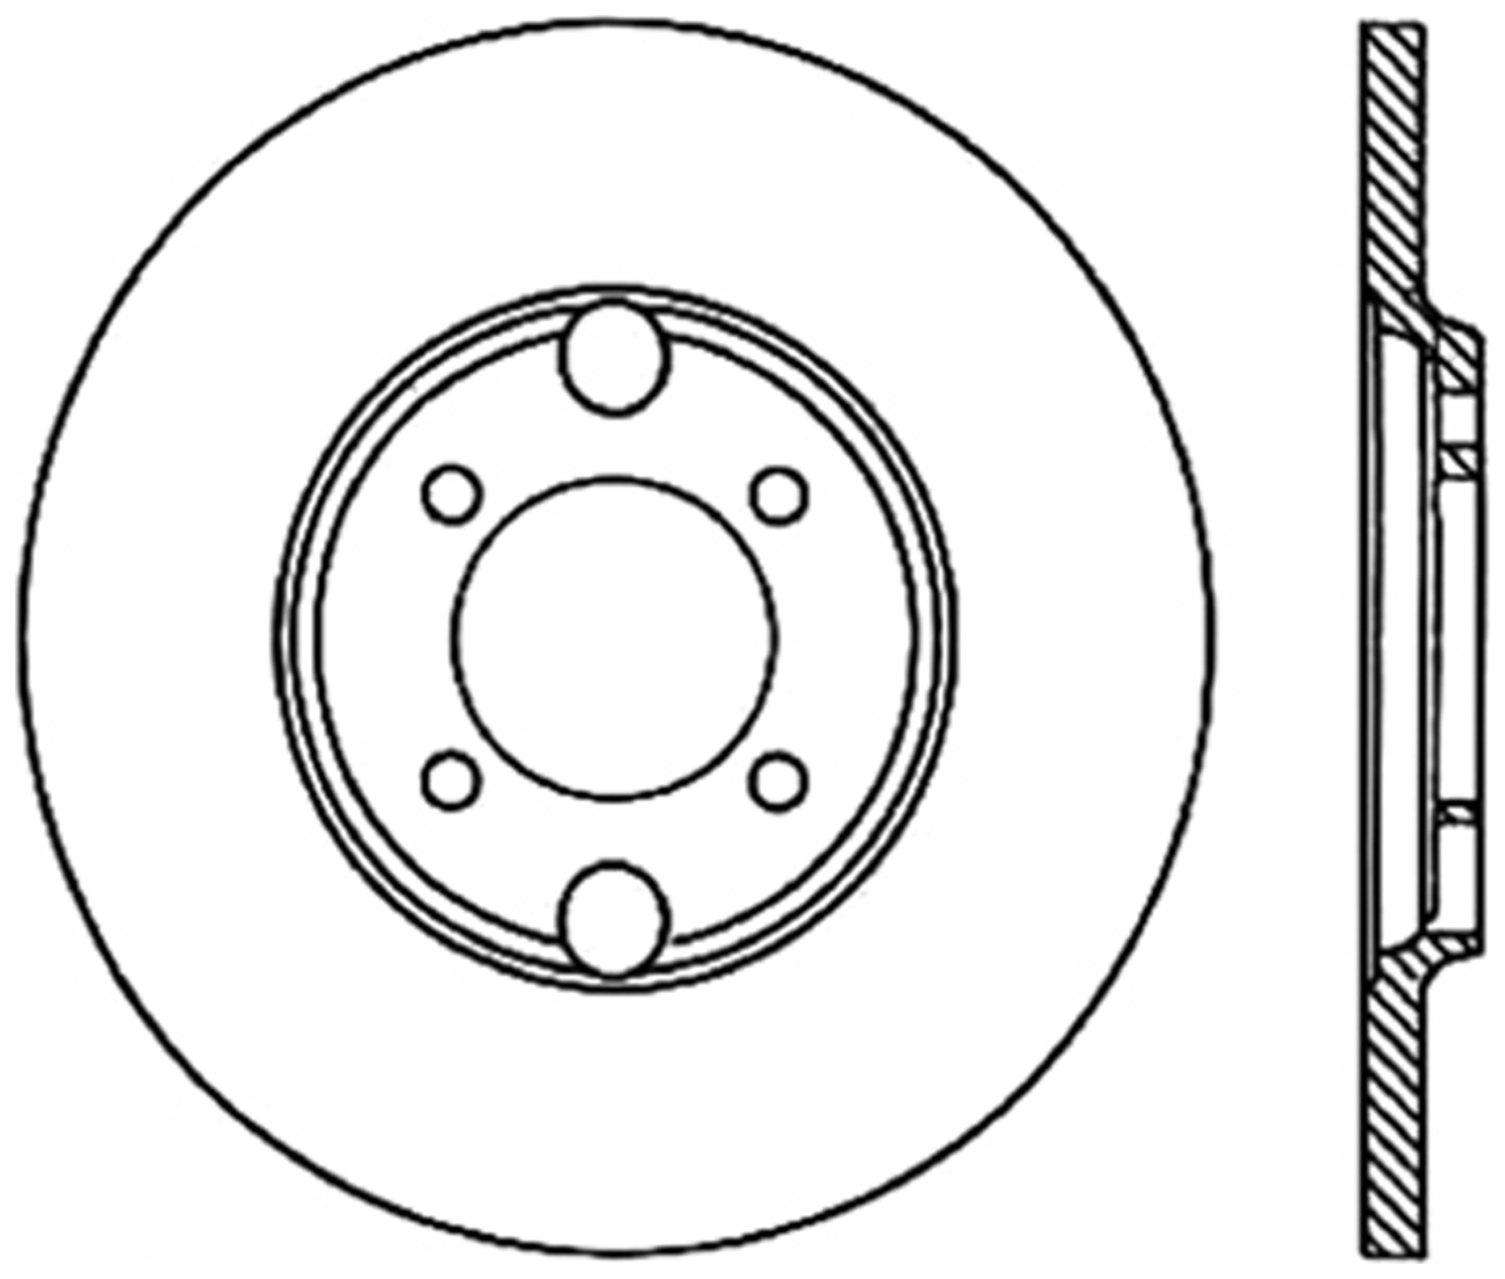 1992 jaguar xjs disc brake rotor autopartskart 89 GMC Sierra Rear Brake Assembly 1992 jaguar xjs disc brake rotor ce 121 20008